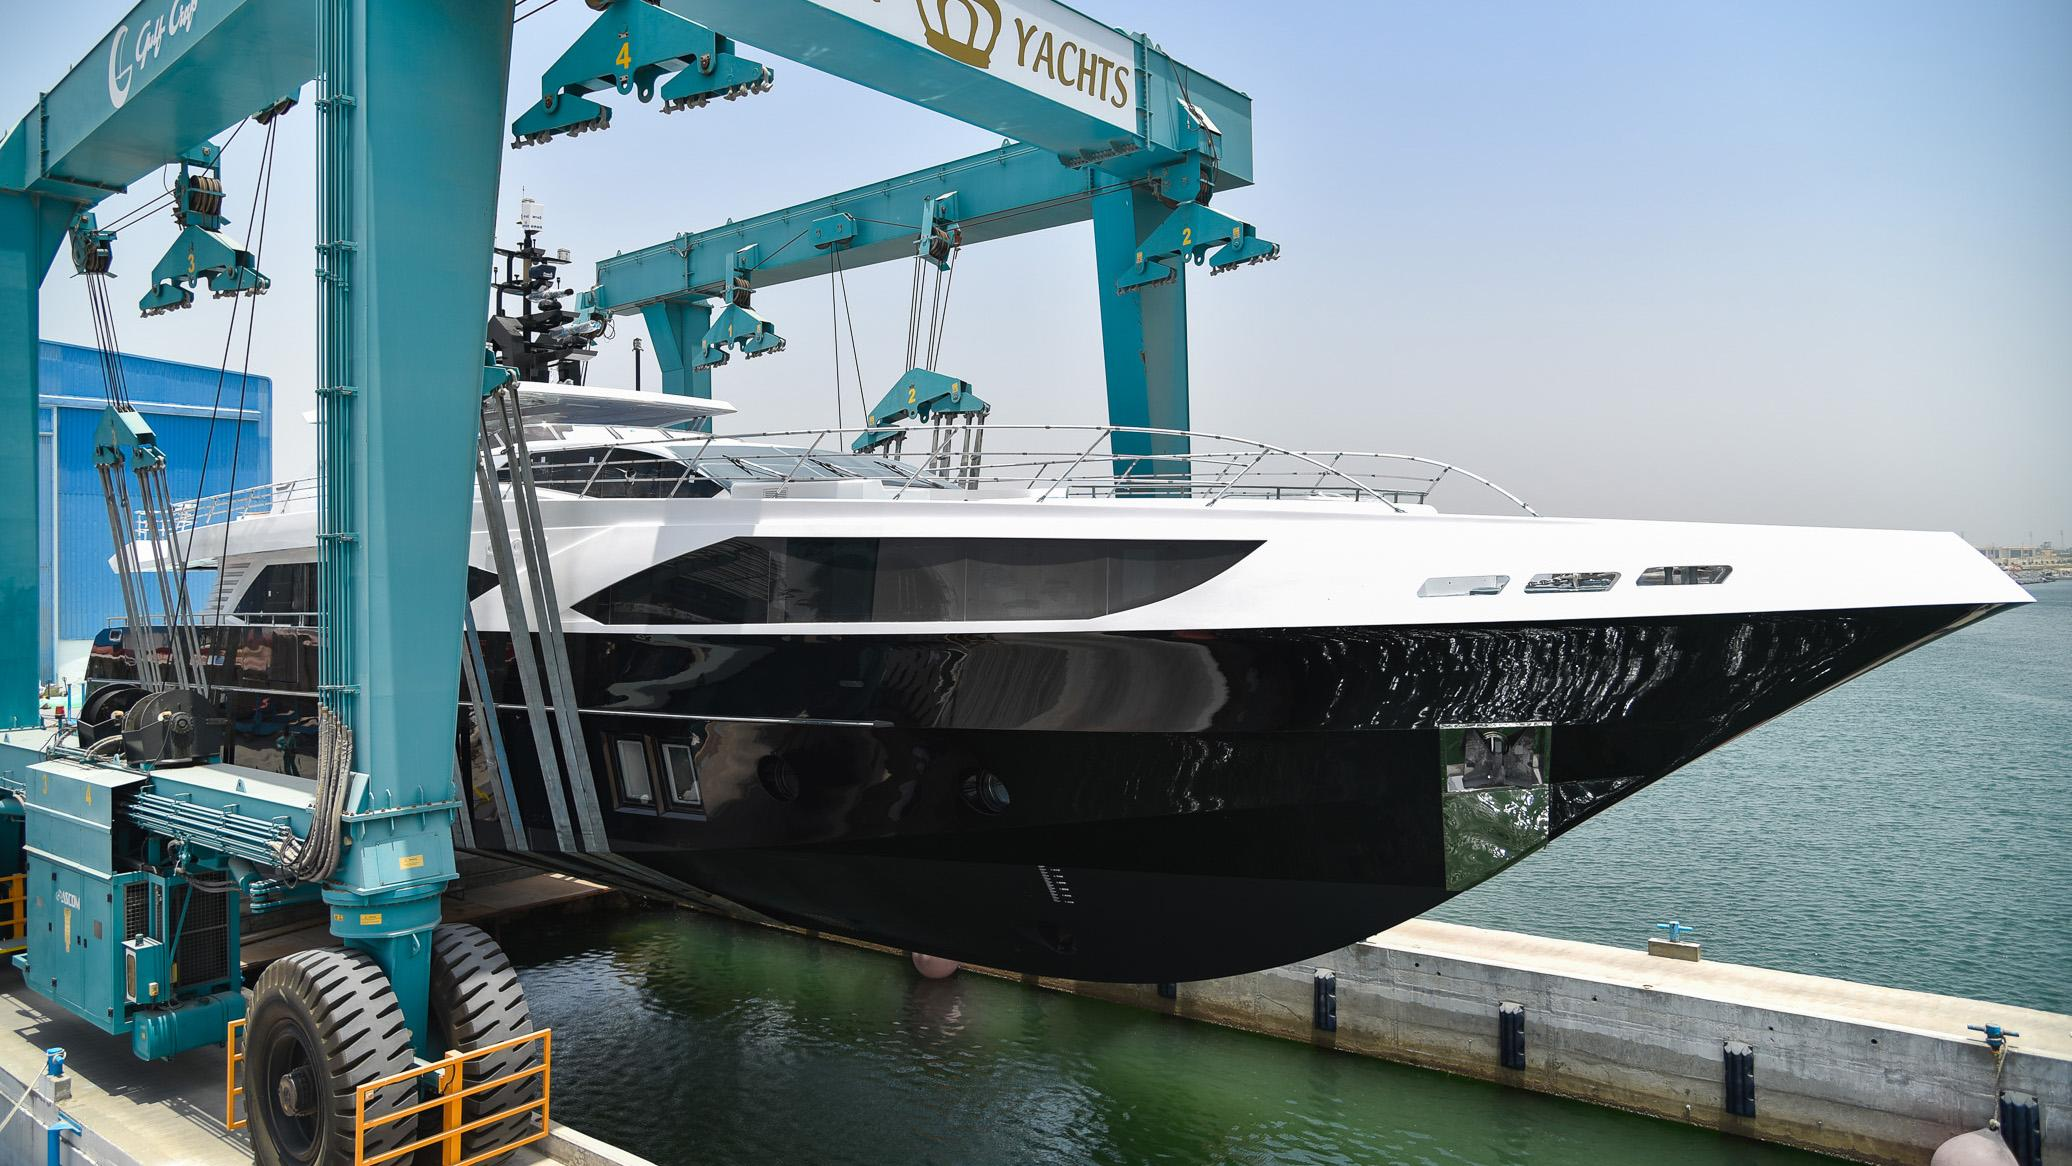 ghost ii motoryacht gulf craft majesty 122 2016 38m half profile launch